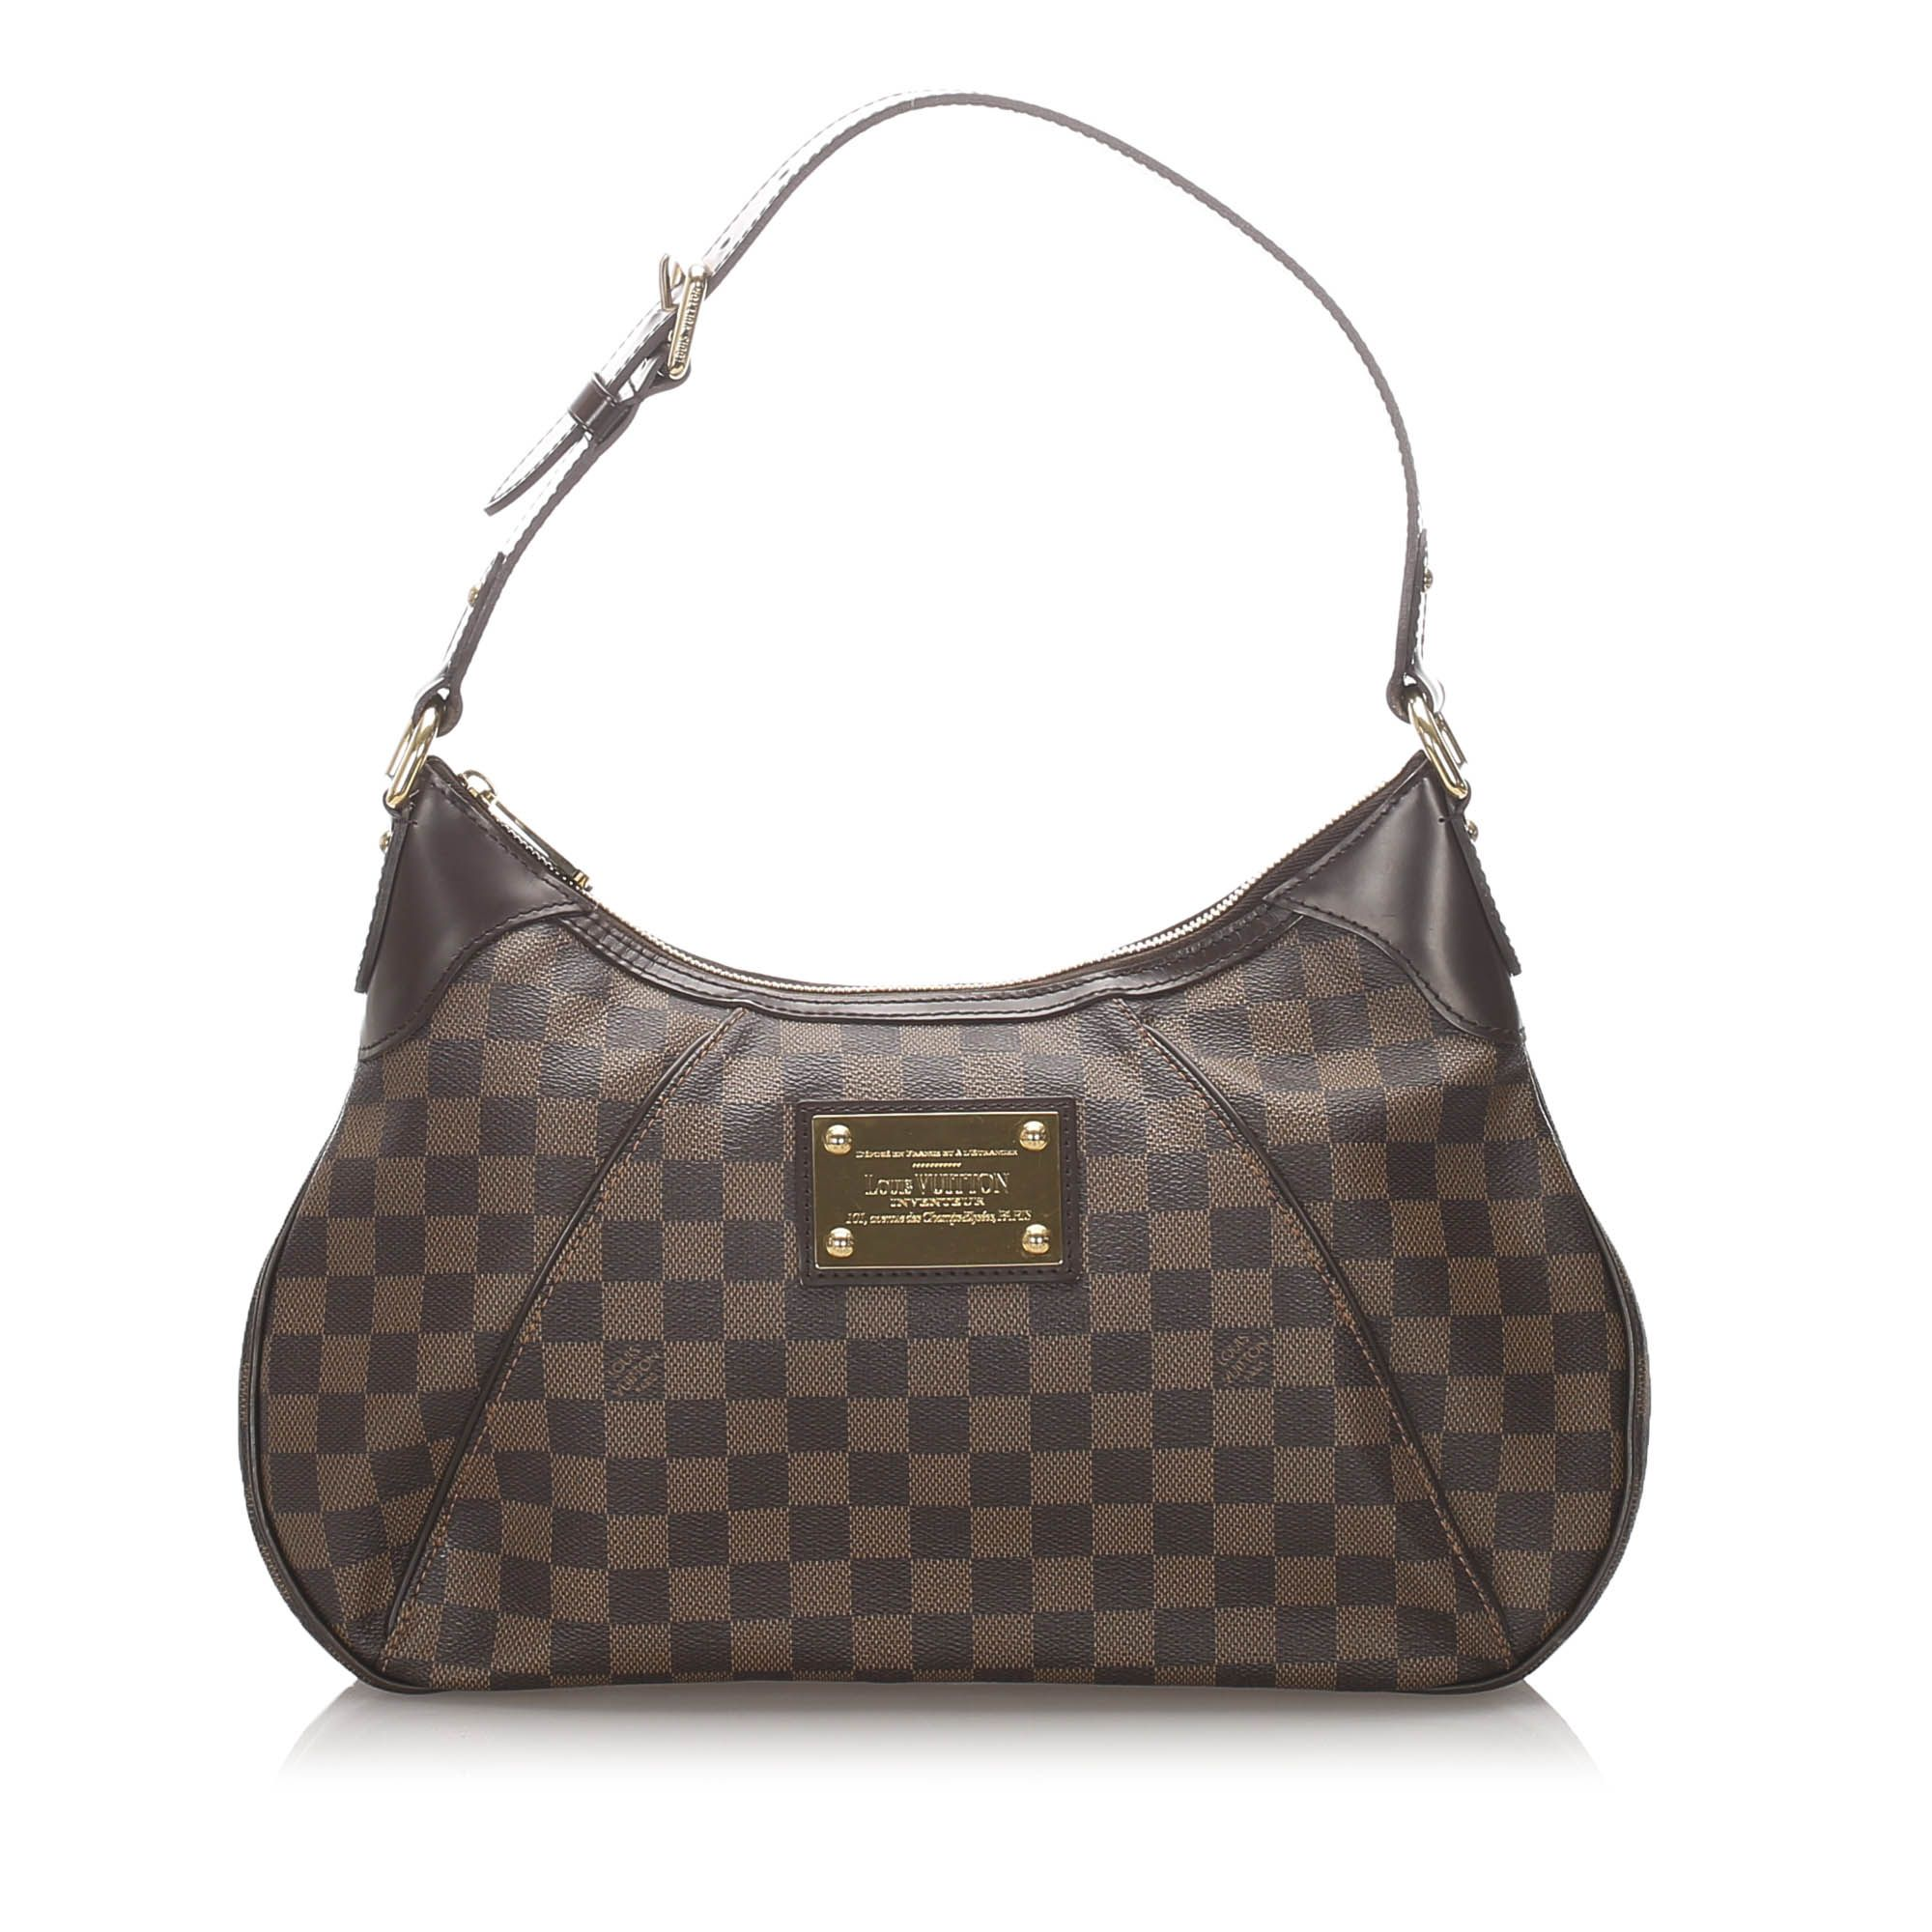 Vintage Louis Vuitton Damier Ebene Thames GM Brown